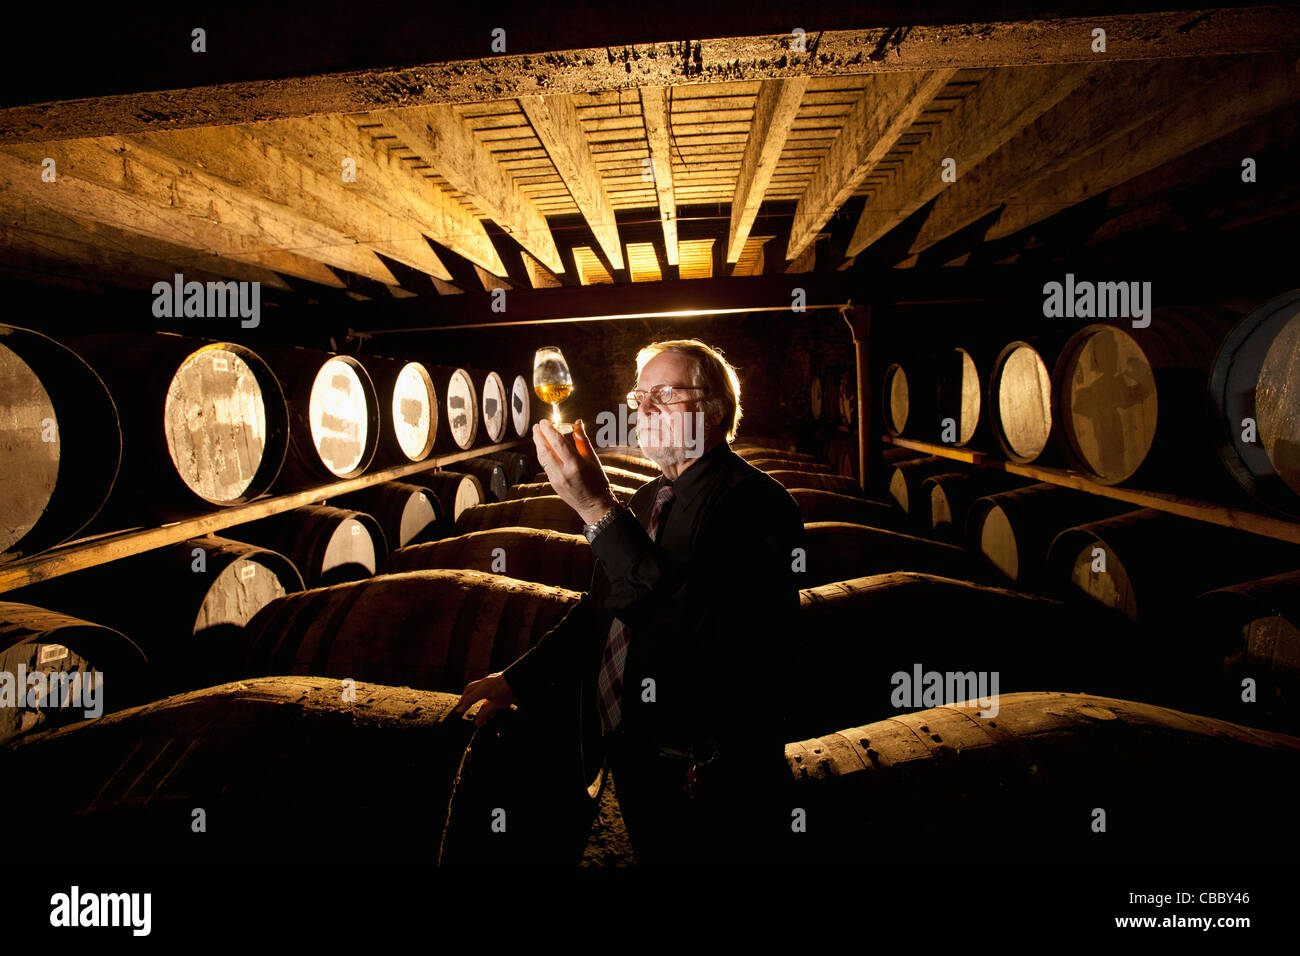 Test de travailleur en whisky distillery Photo Stock